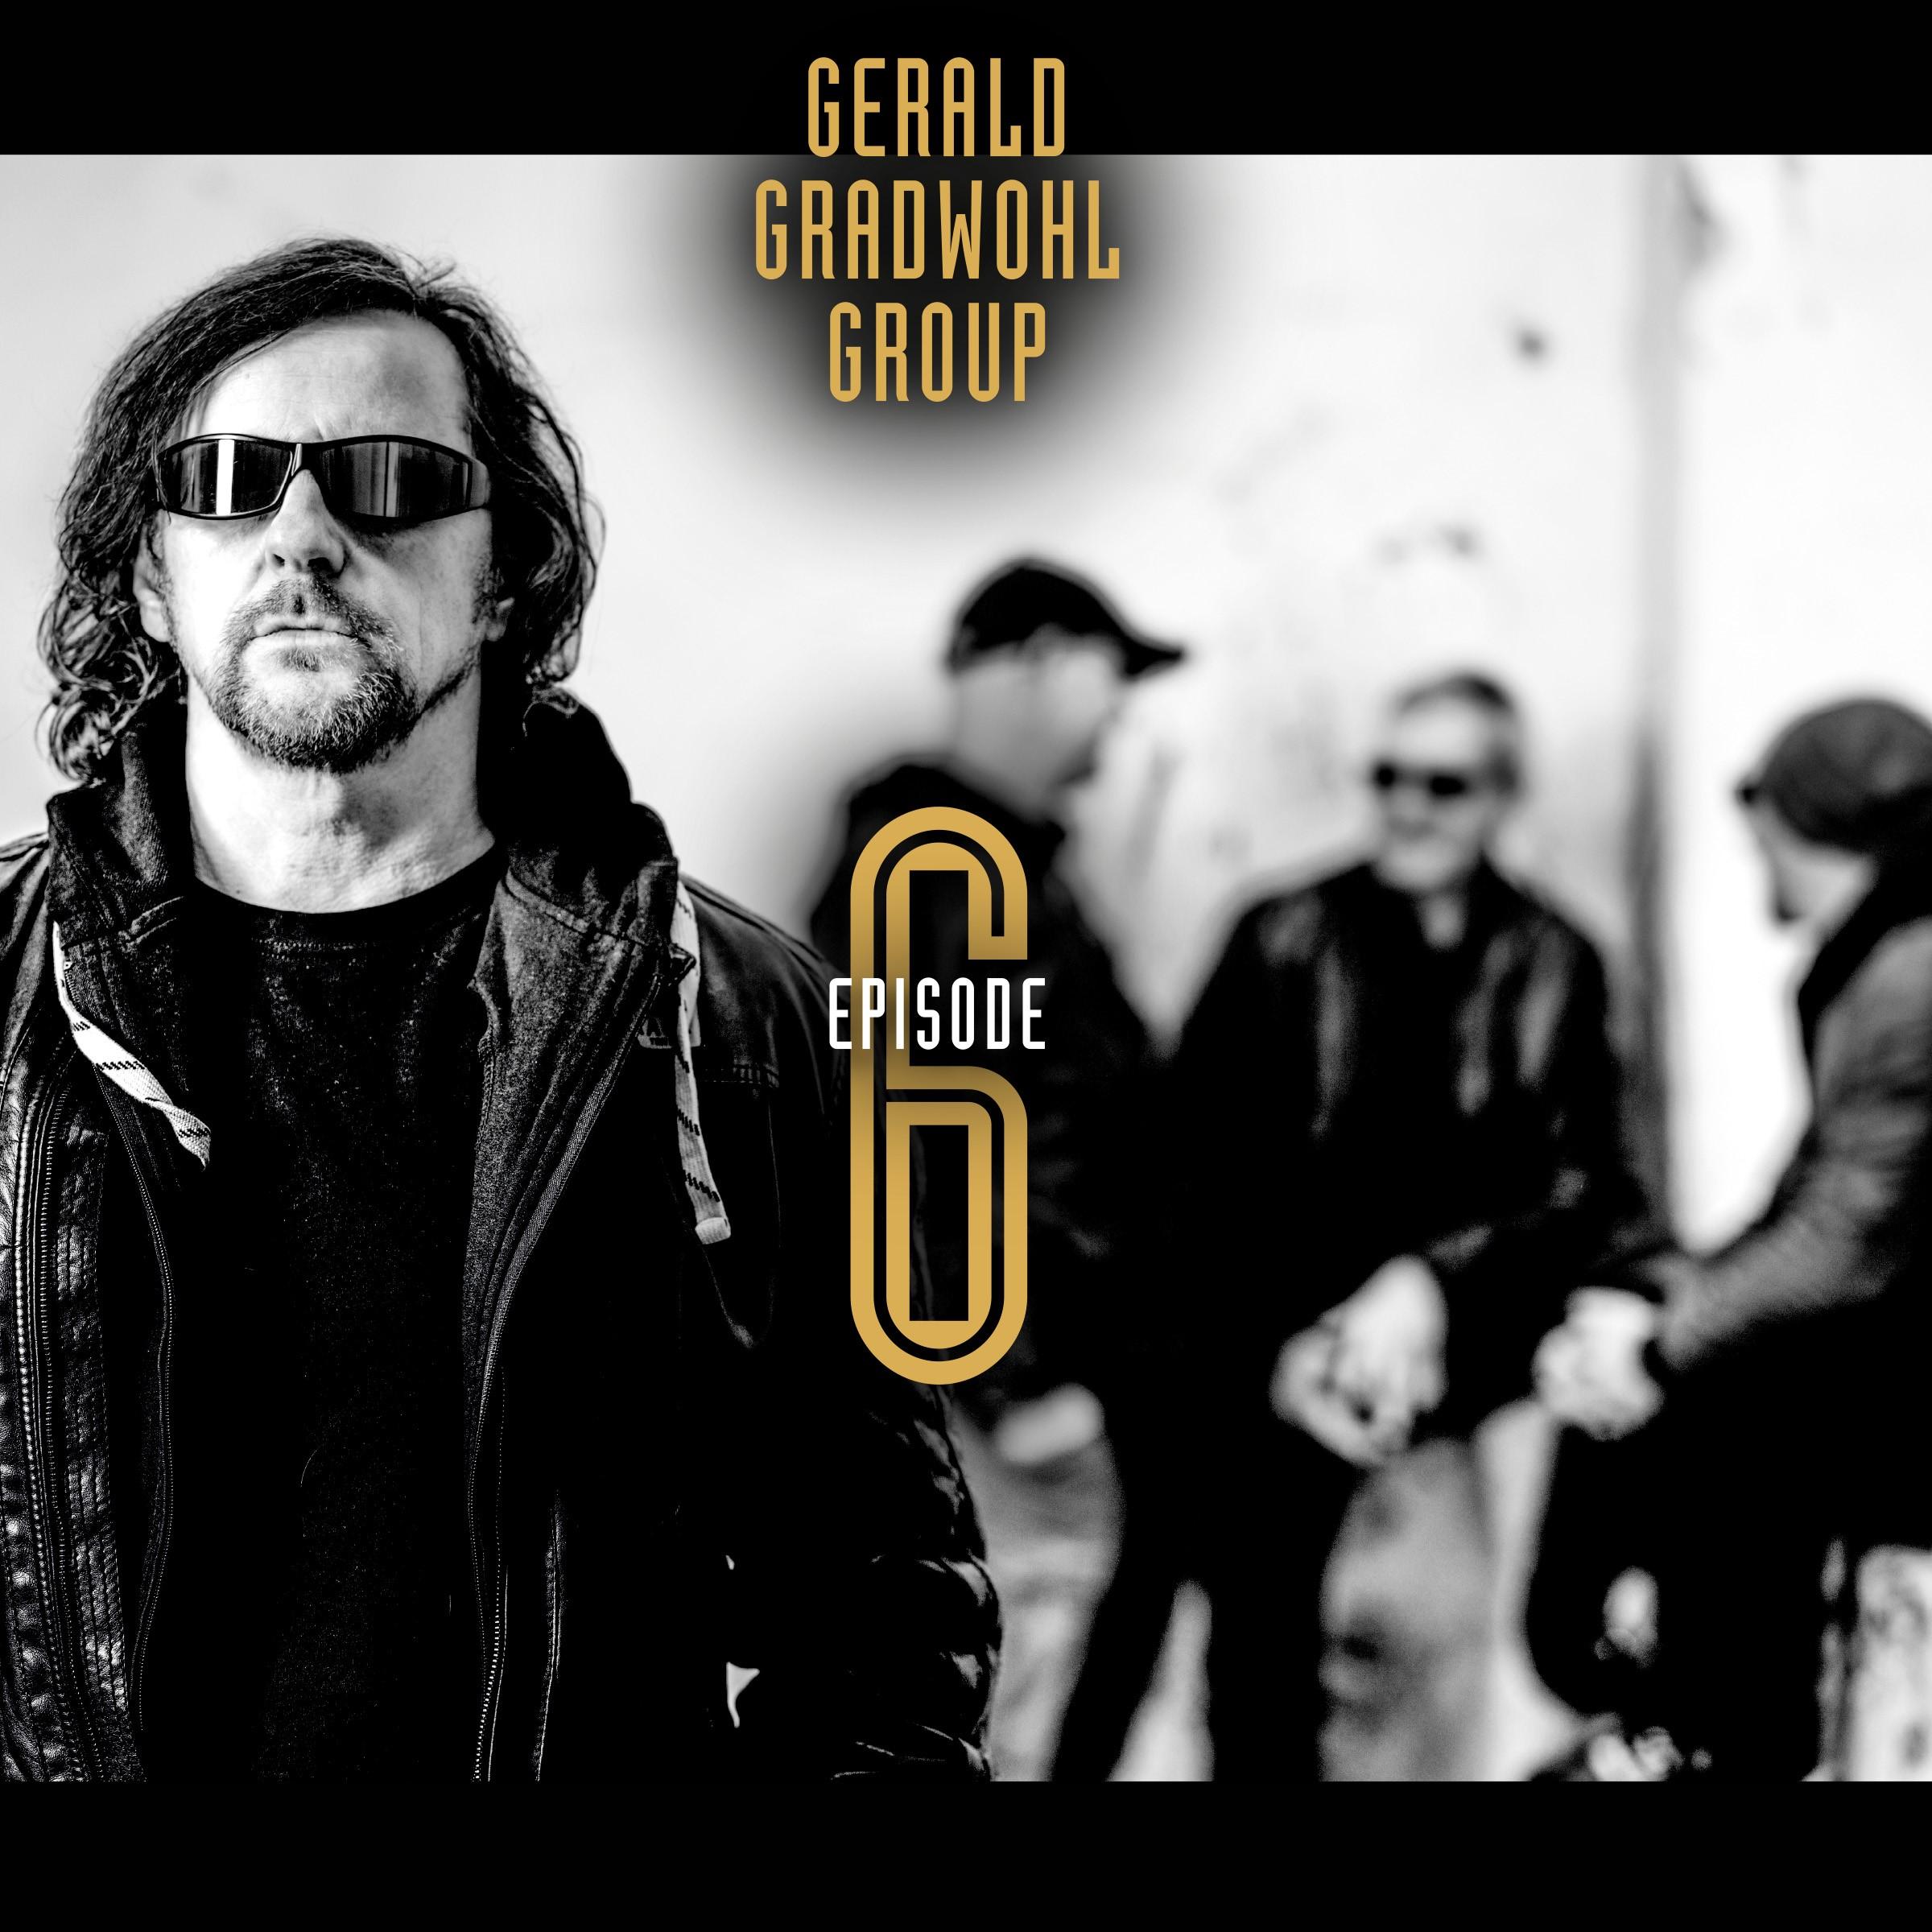 GERALD GRADWOHL - Episode 6 cover